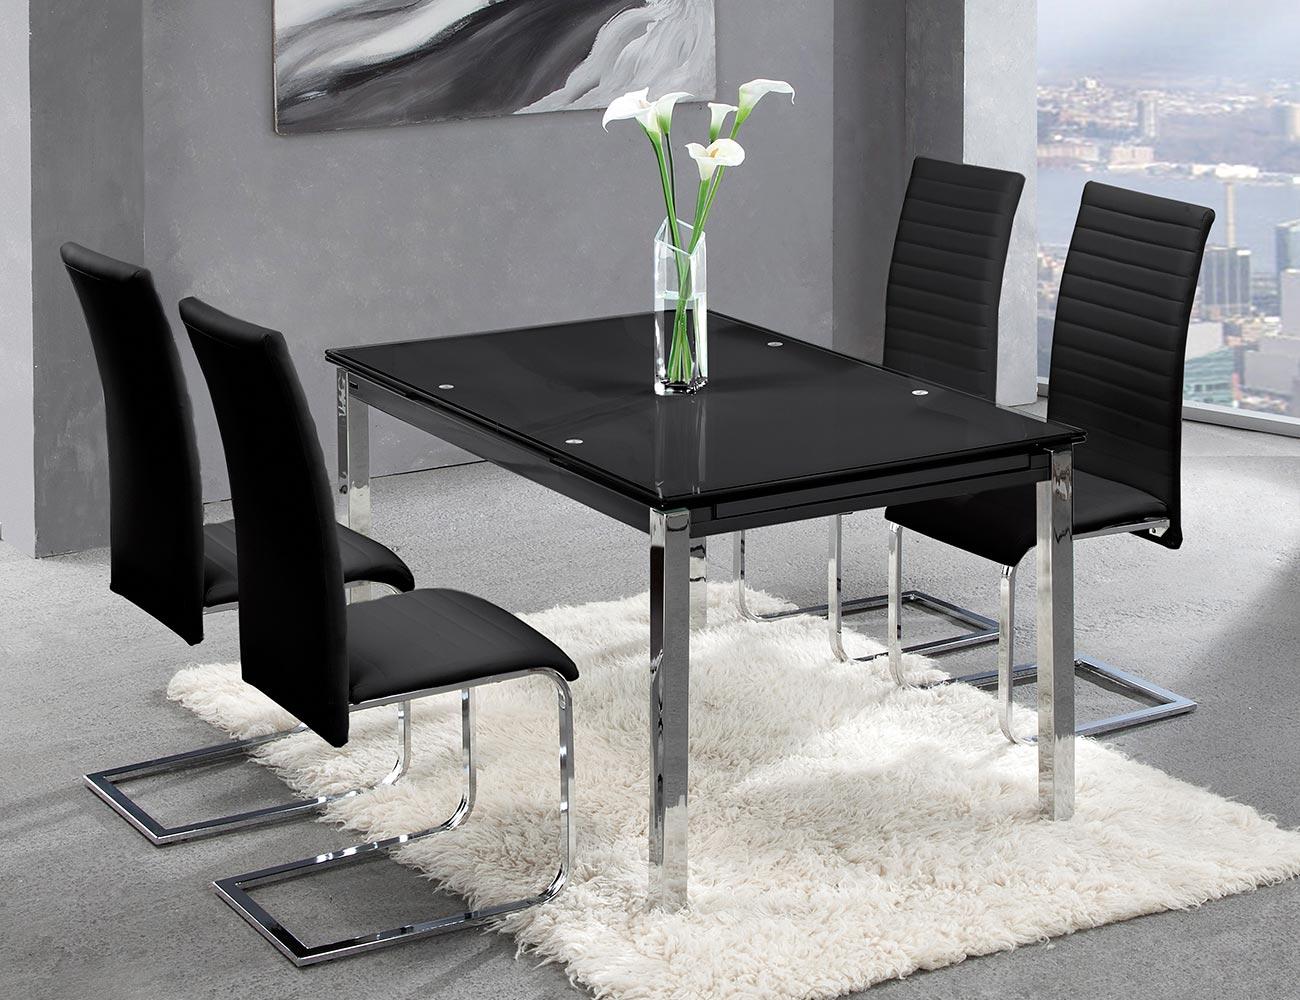 Comedor vidrio templado mesa de comedor cristal templado - Mesa de comedor cristal ...